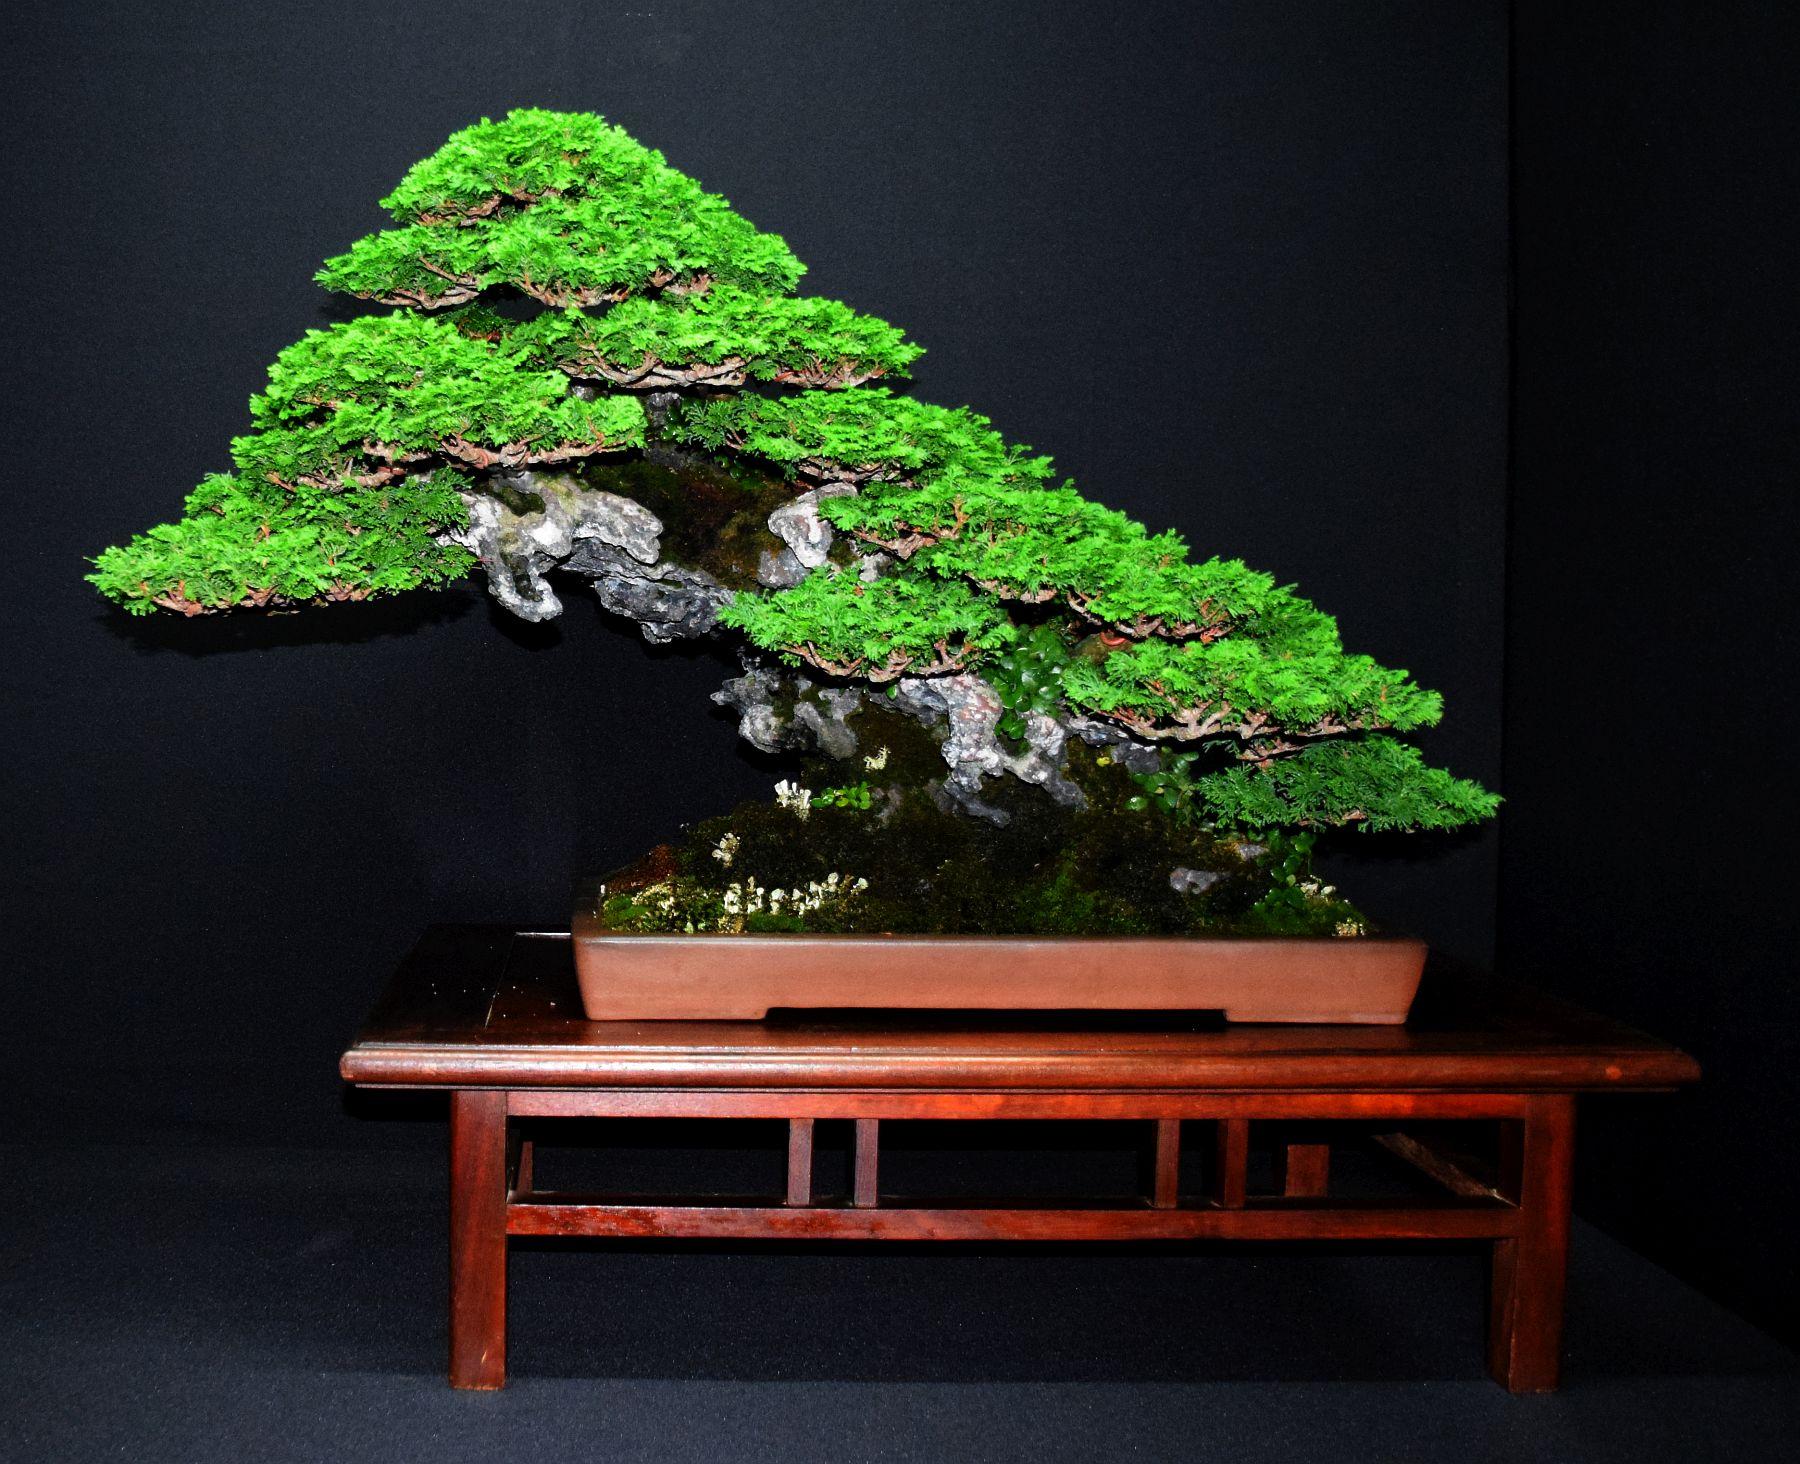 bonsai-museum-luis-vallejo-016